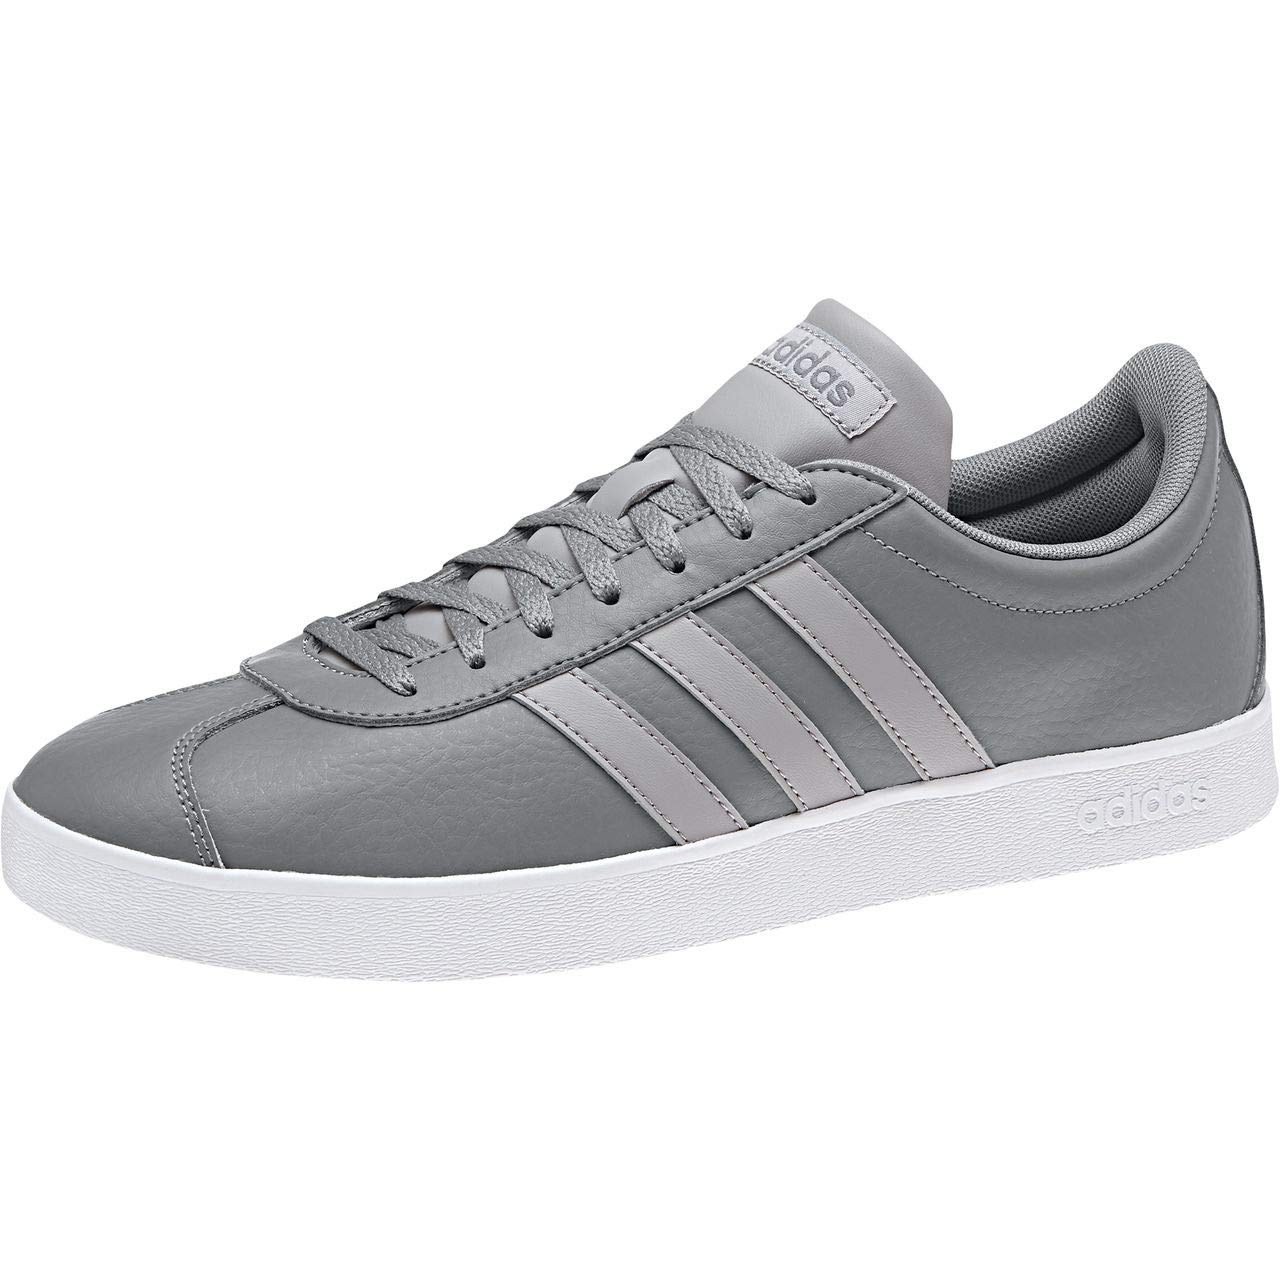 Adidas Herren Vl Court 2.0 2.0 2.0 Skateboardschuhe  d4b47f